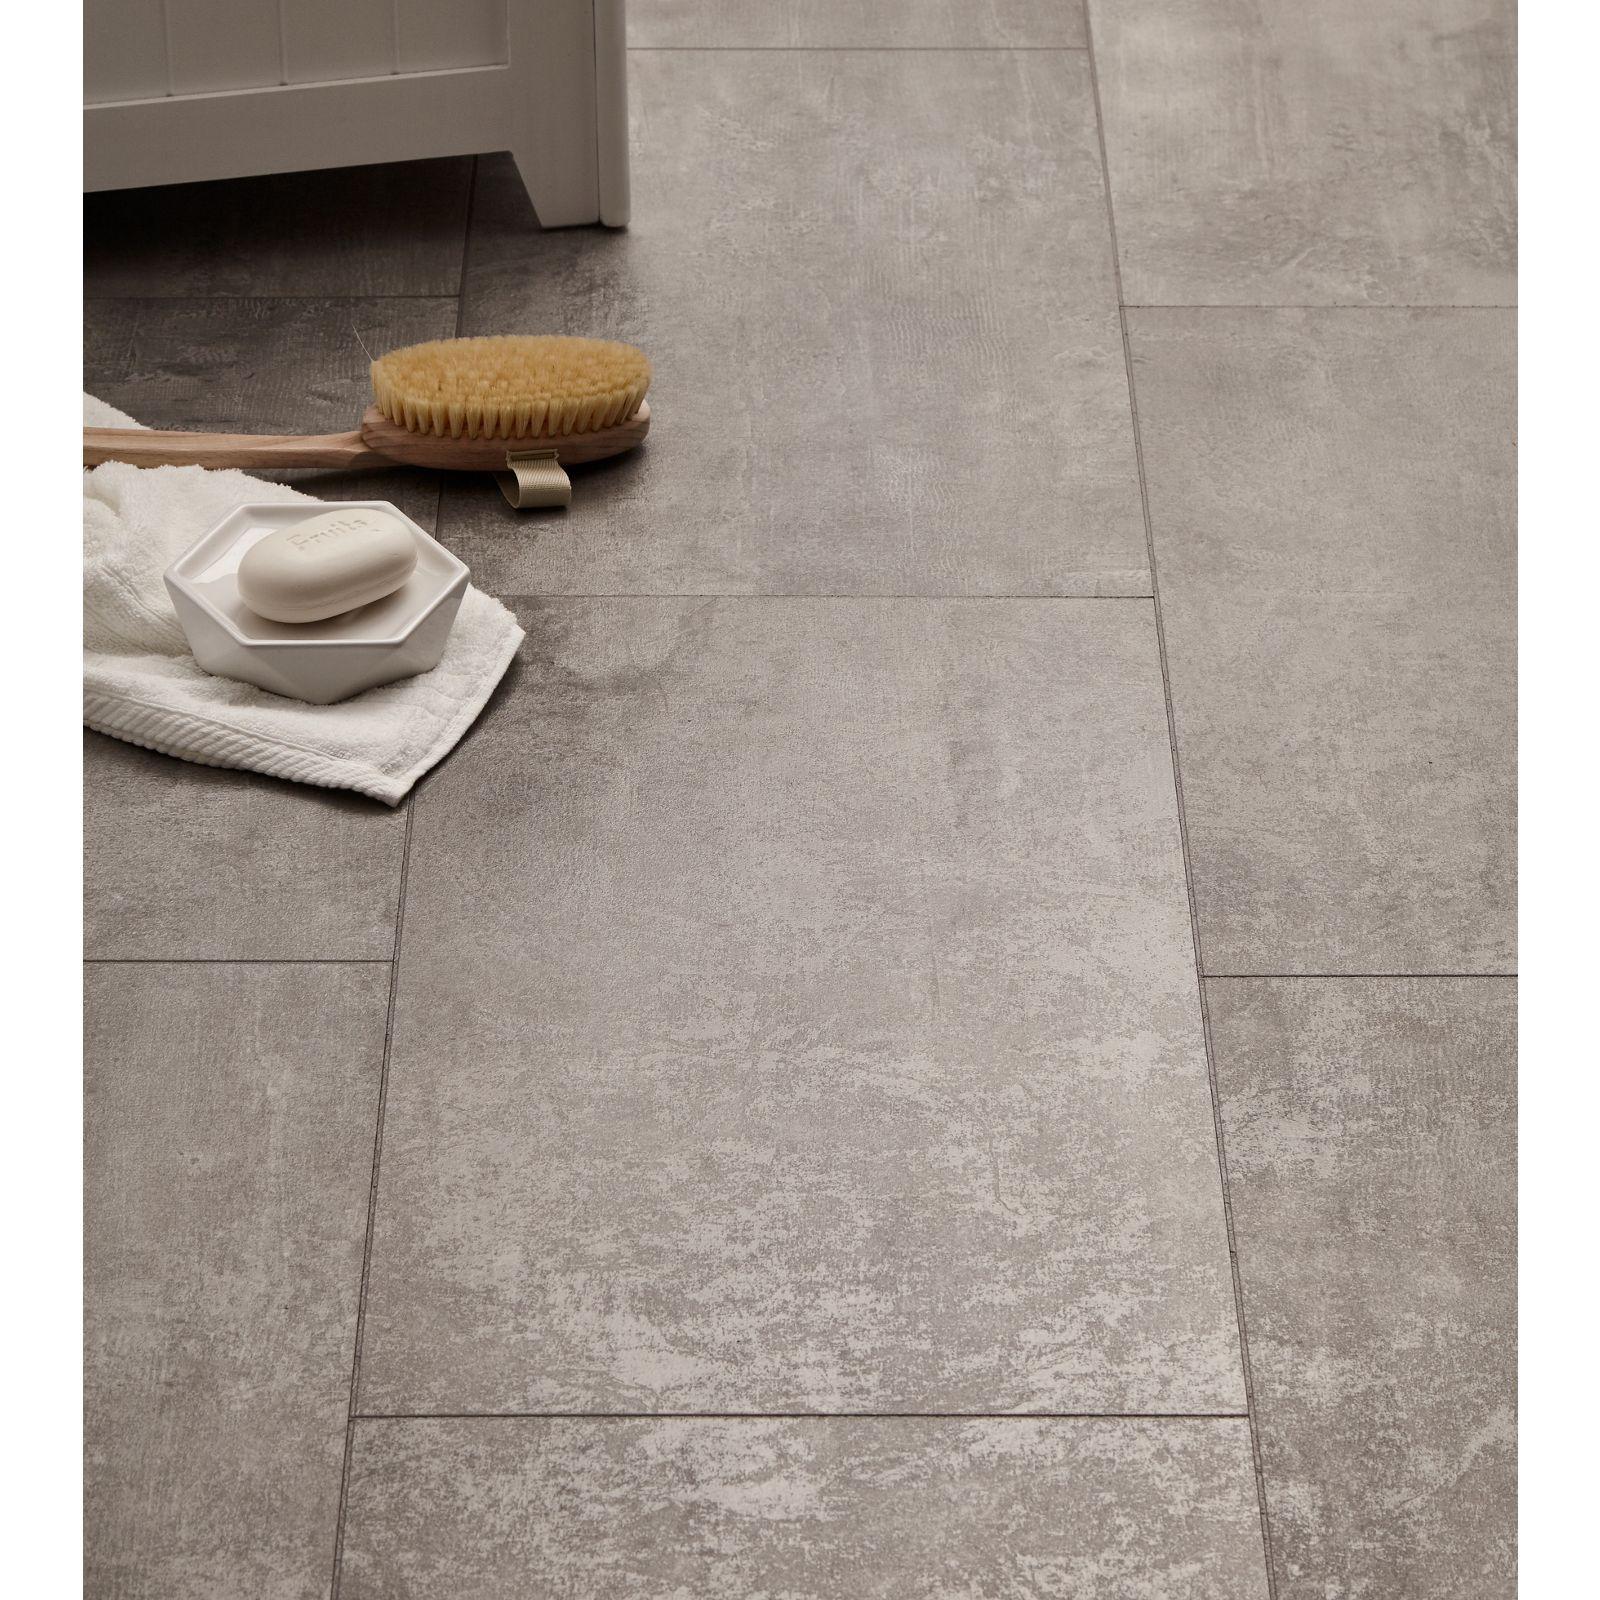 Find Laminae Concrete Tile Effect Laminate Flooring at